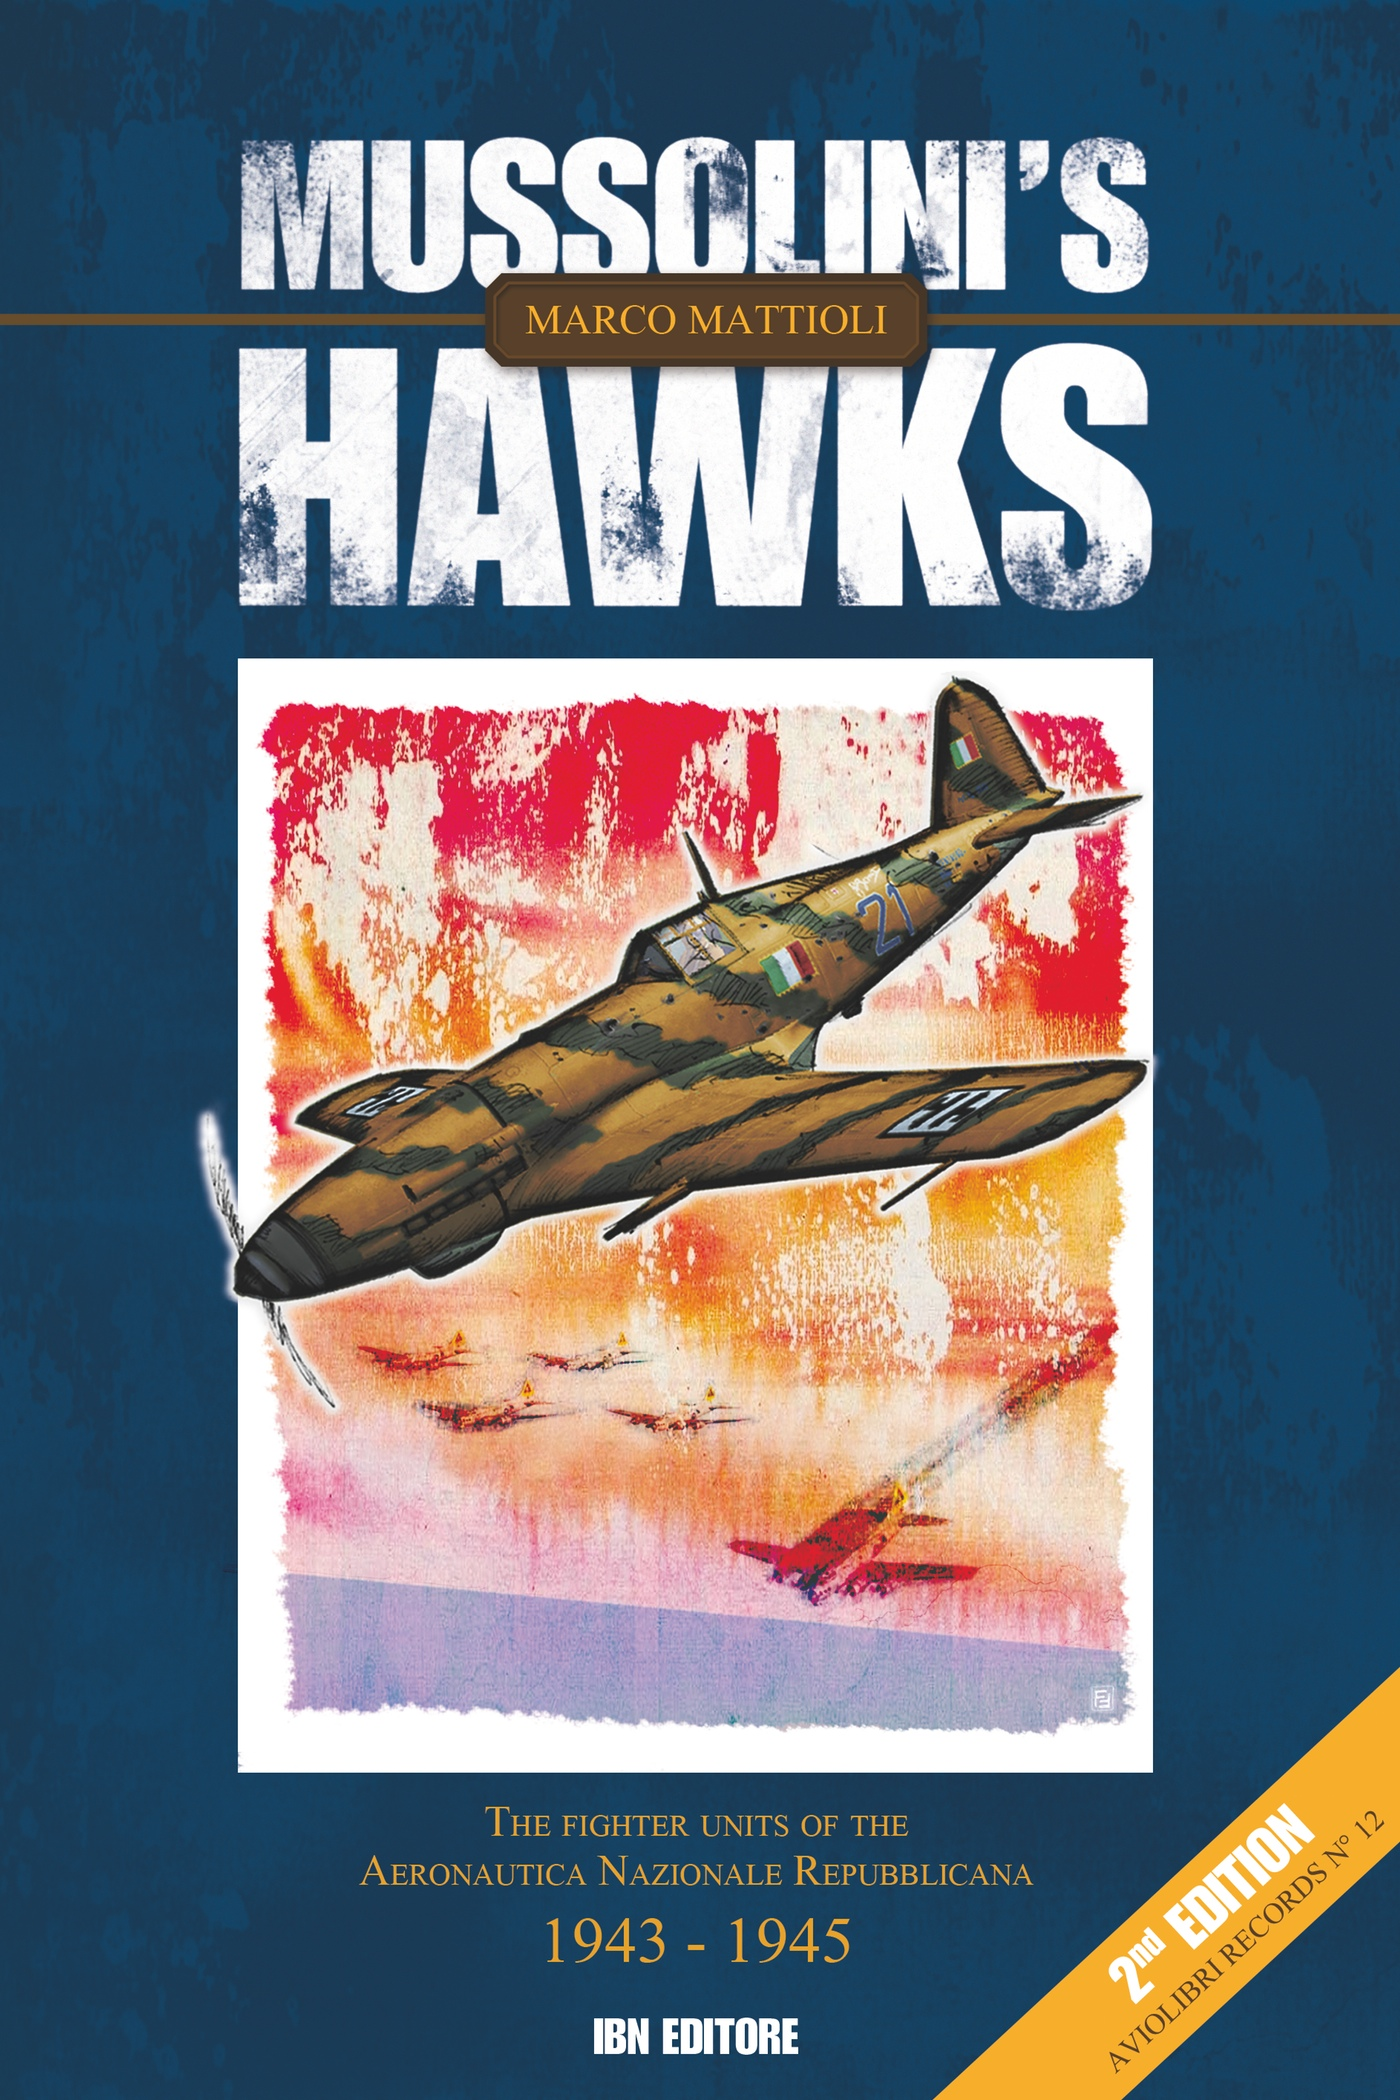 Mussolini's Hawks